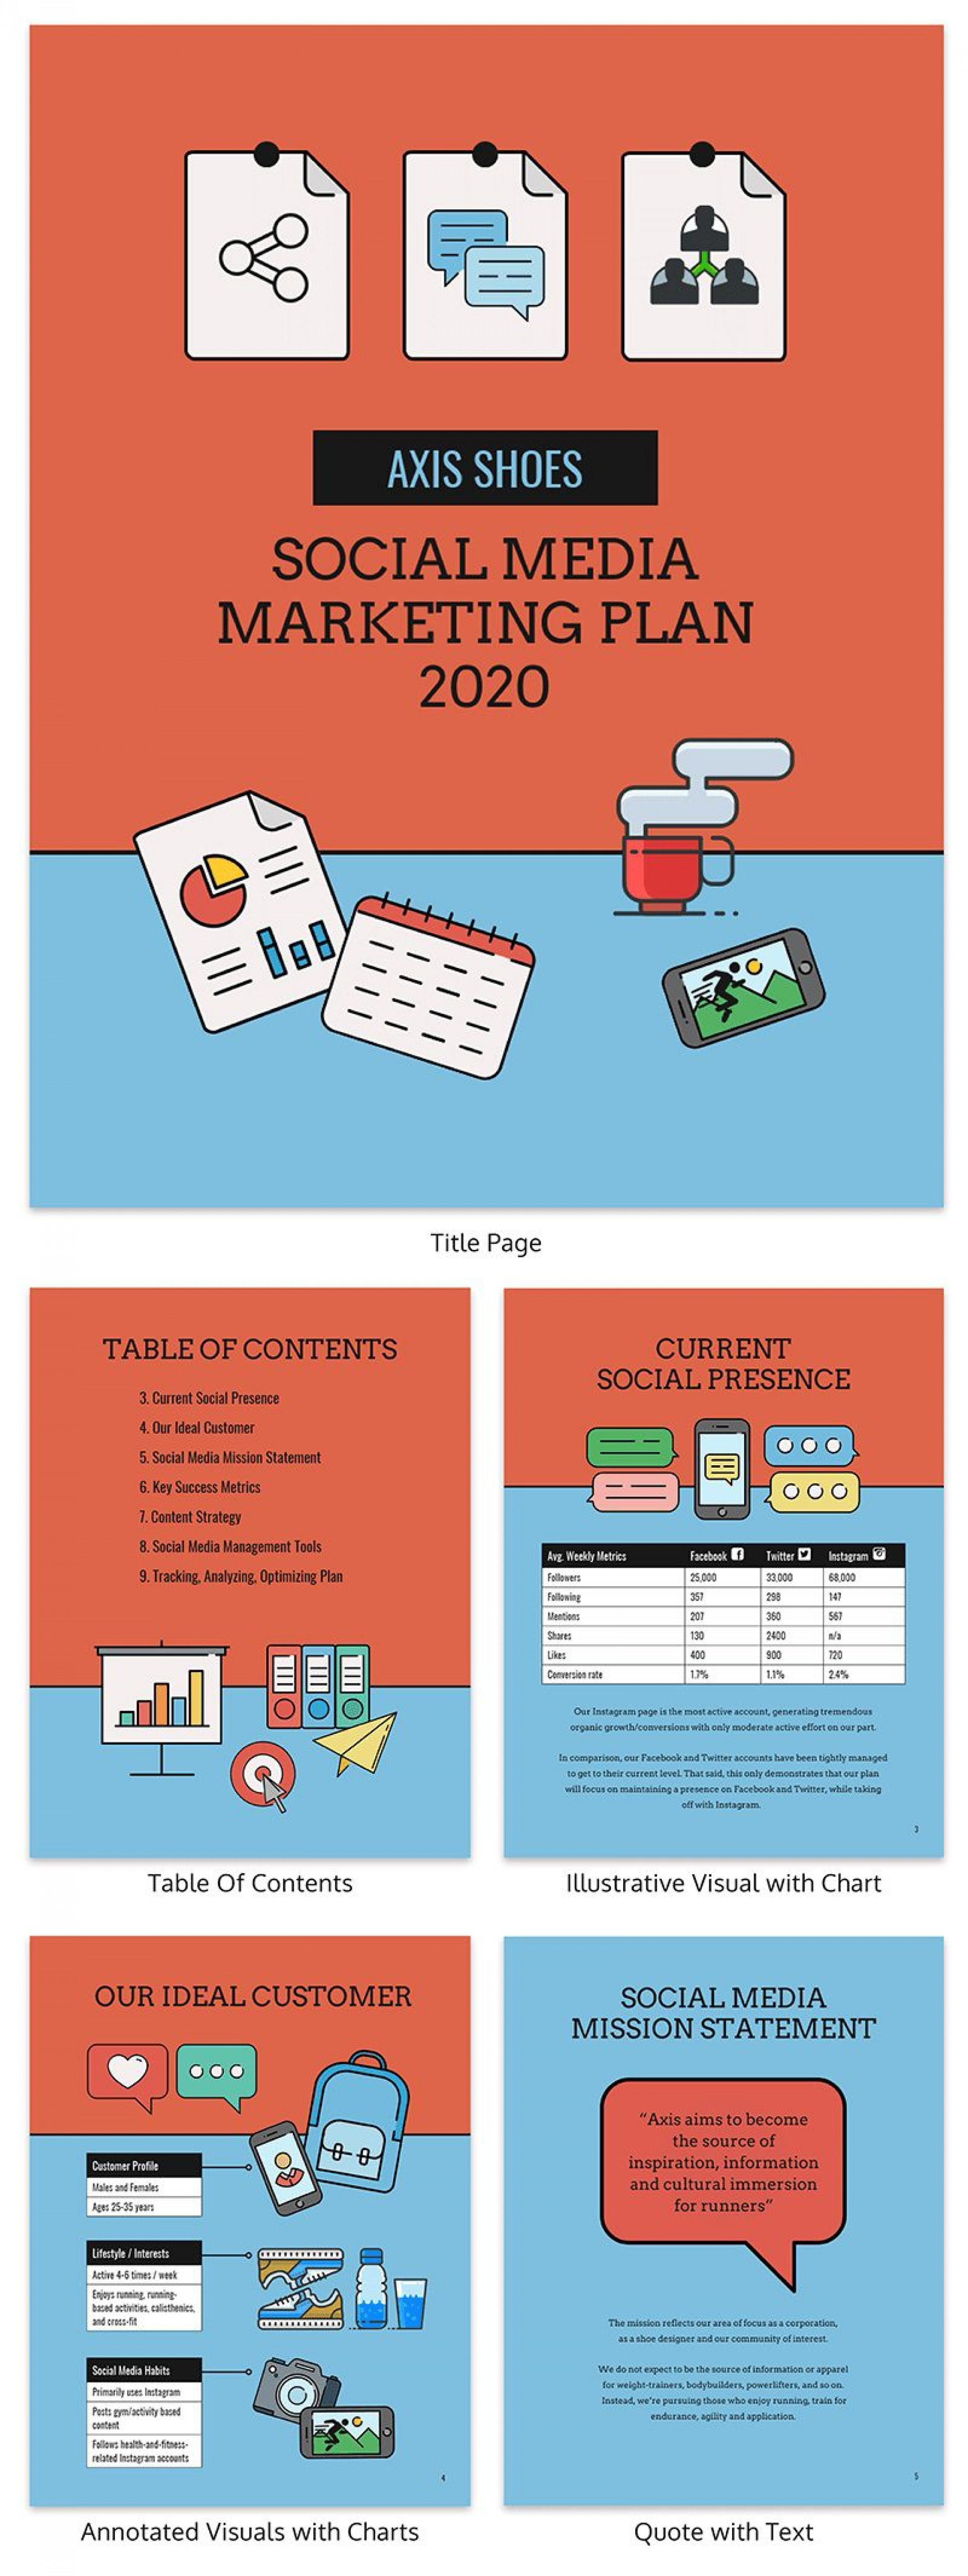 003 Impressive Social Media Marketing Proposal Template Sample  Plan Free Download Pdf Word1920